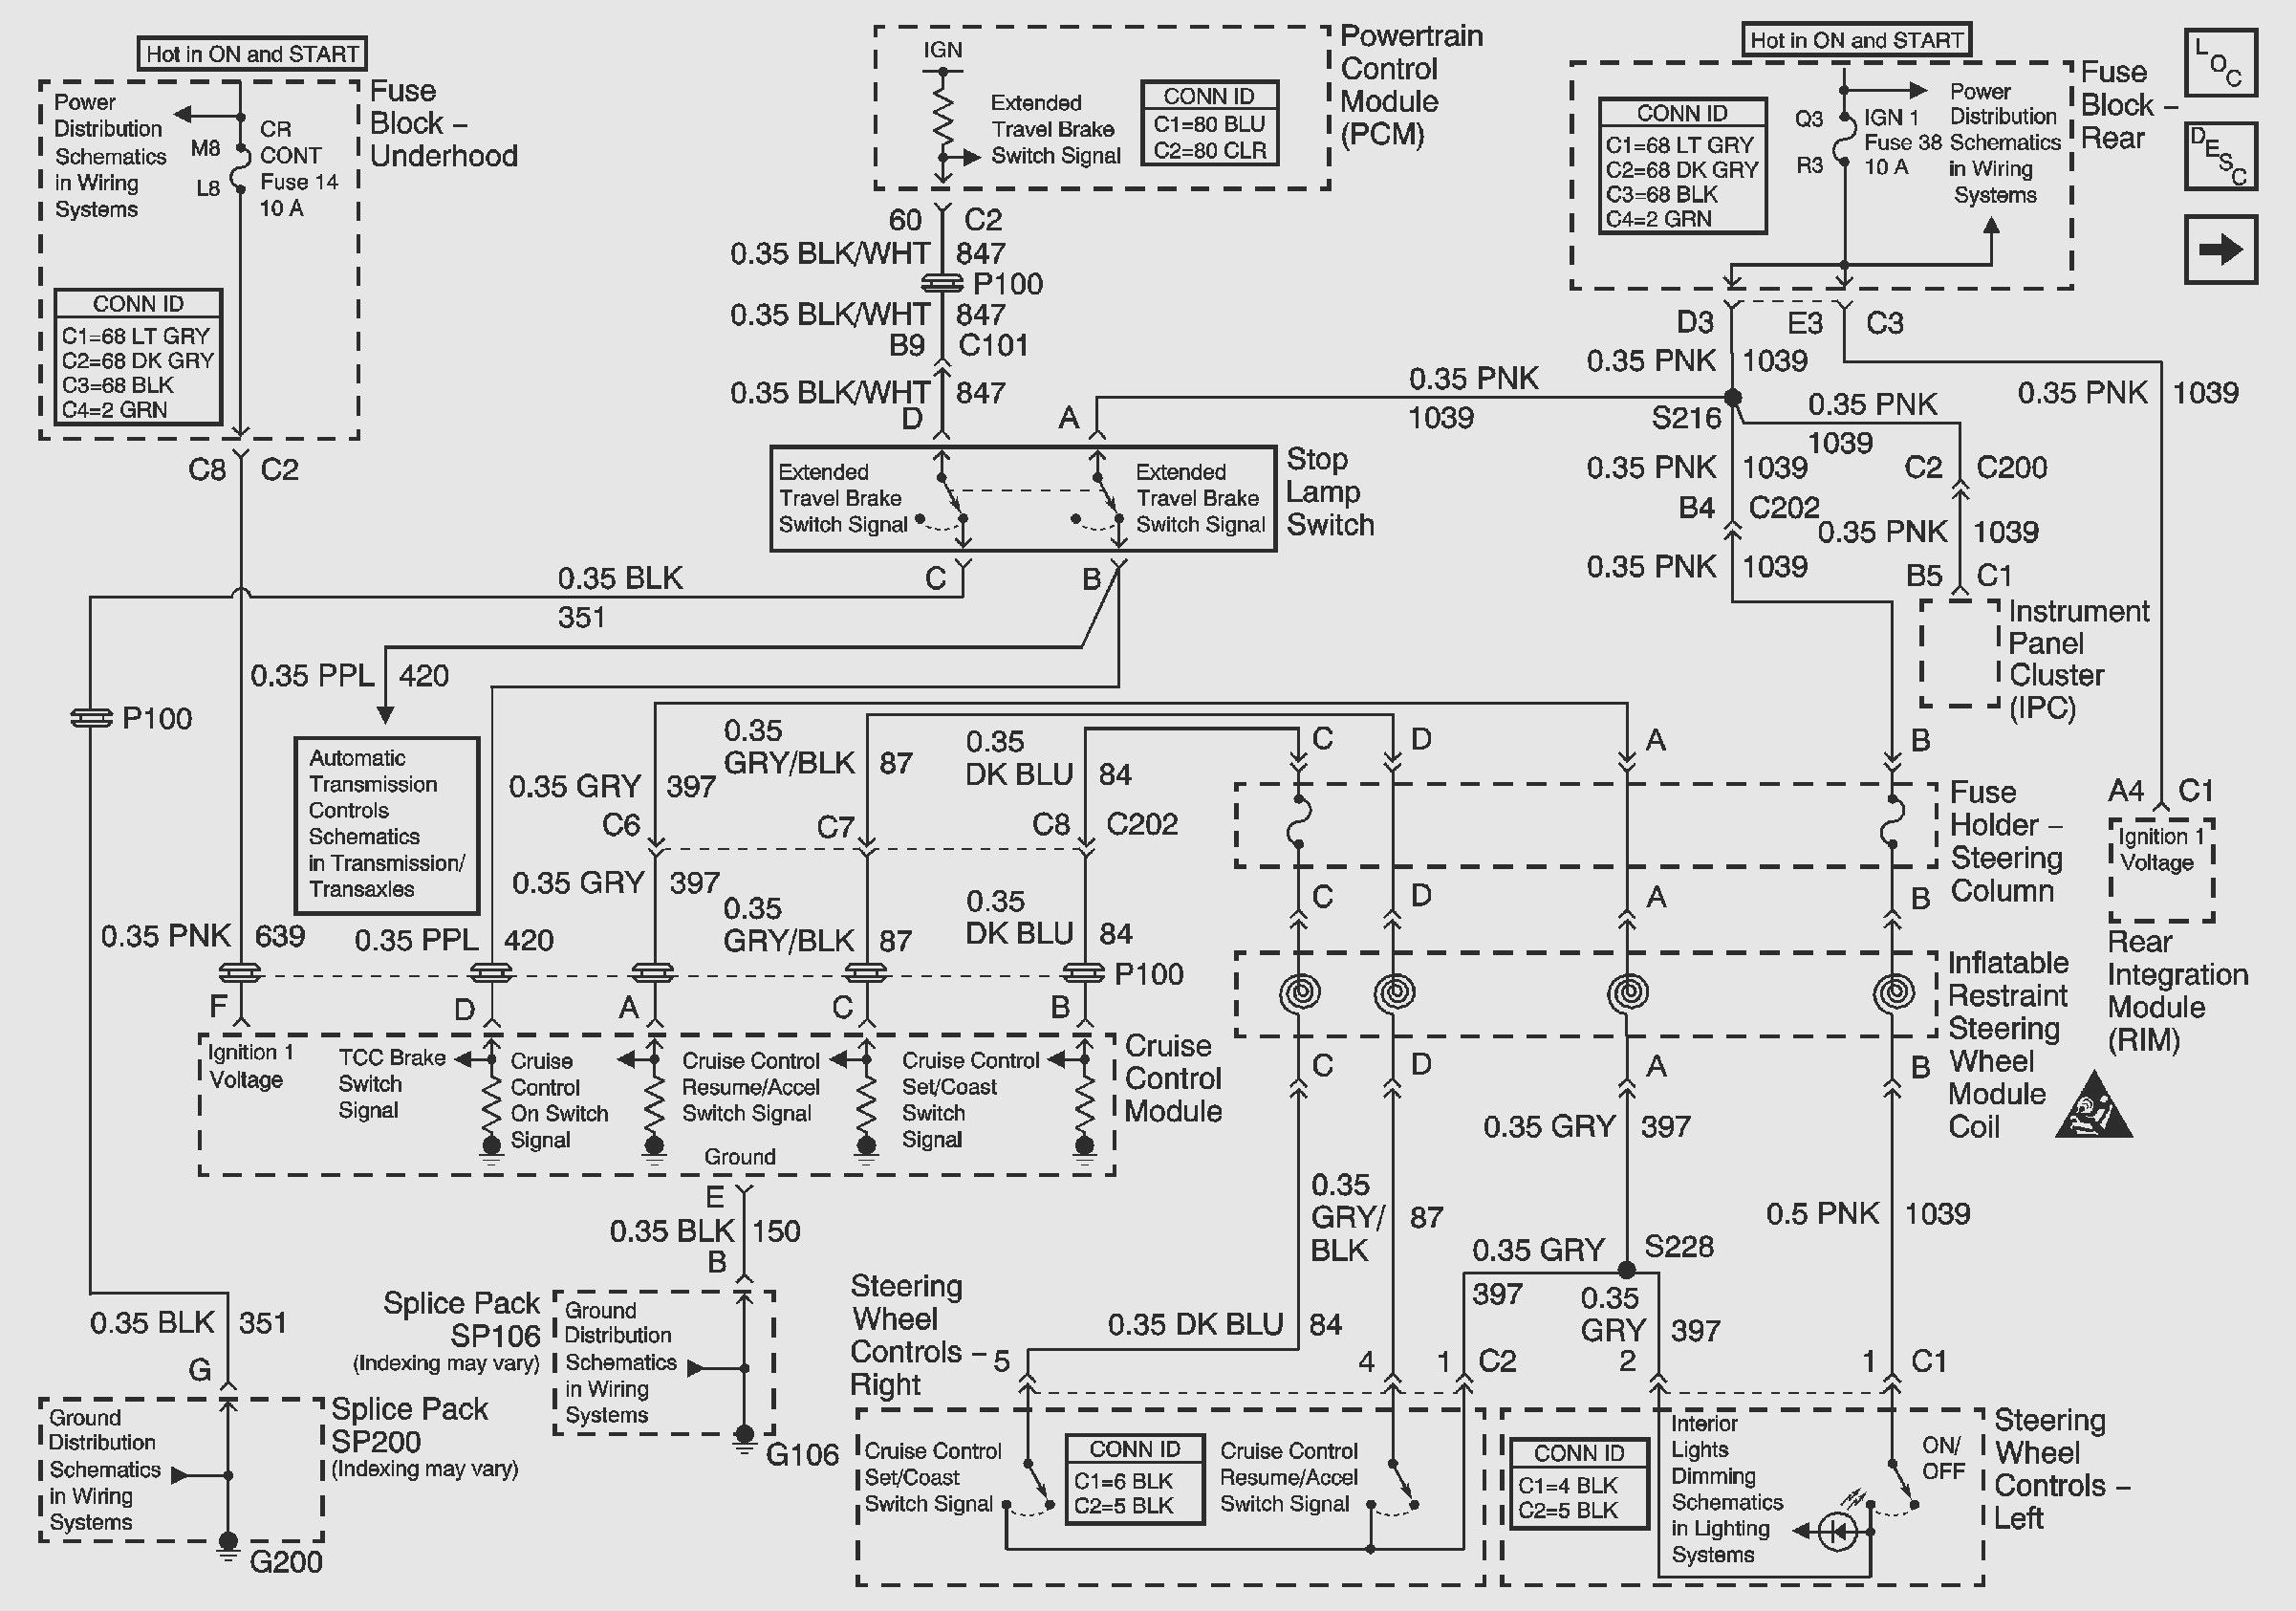 [DIAGRAM] 2000 Freightliner Century Wiring Diagram